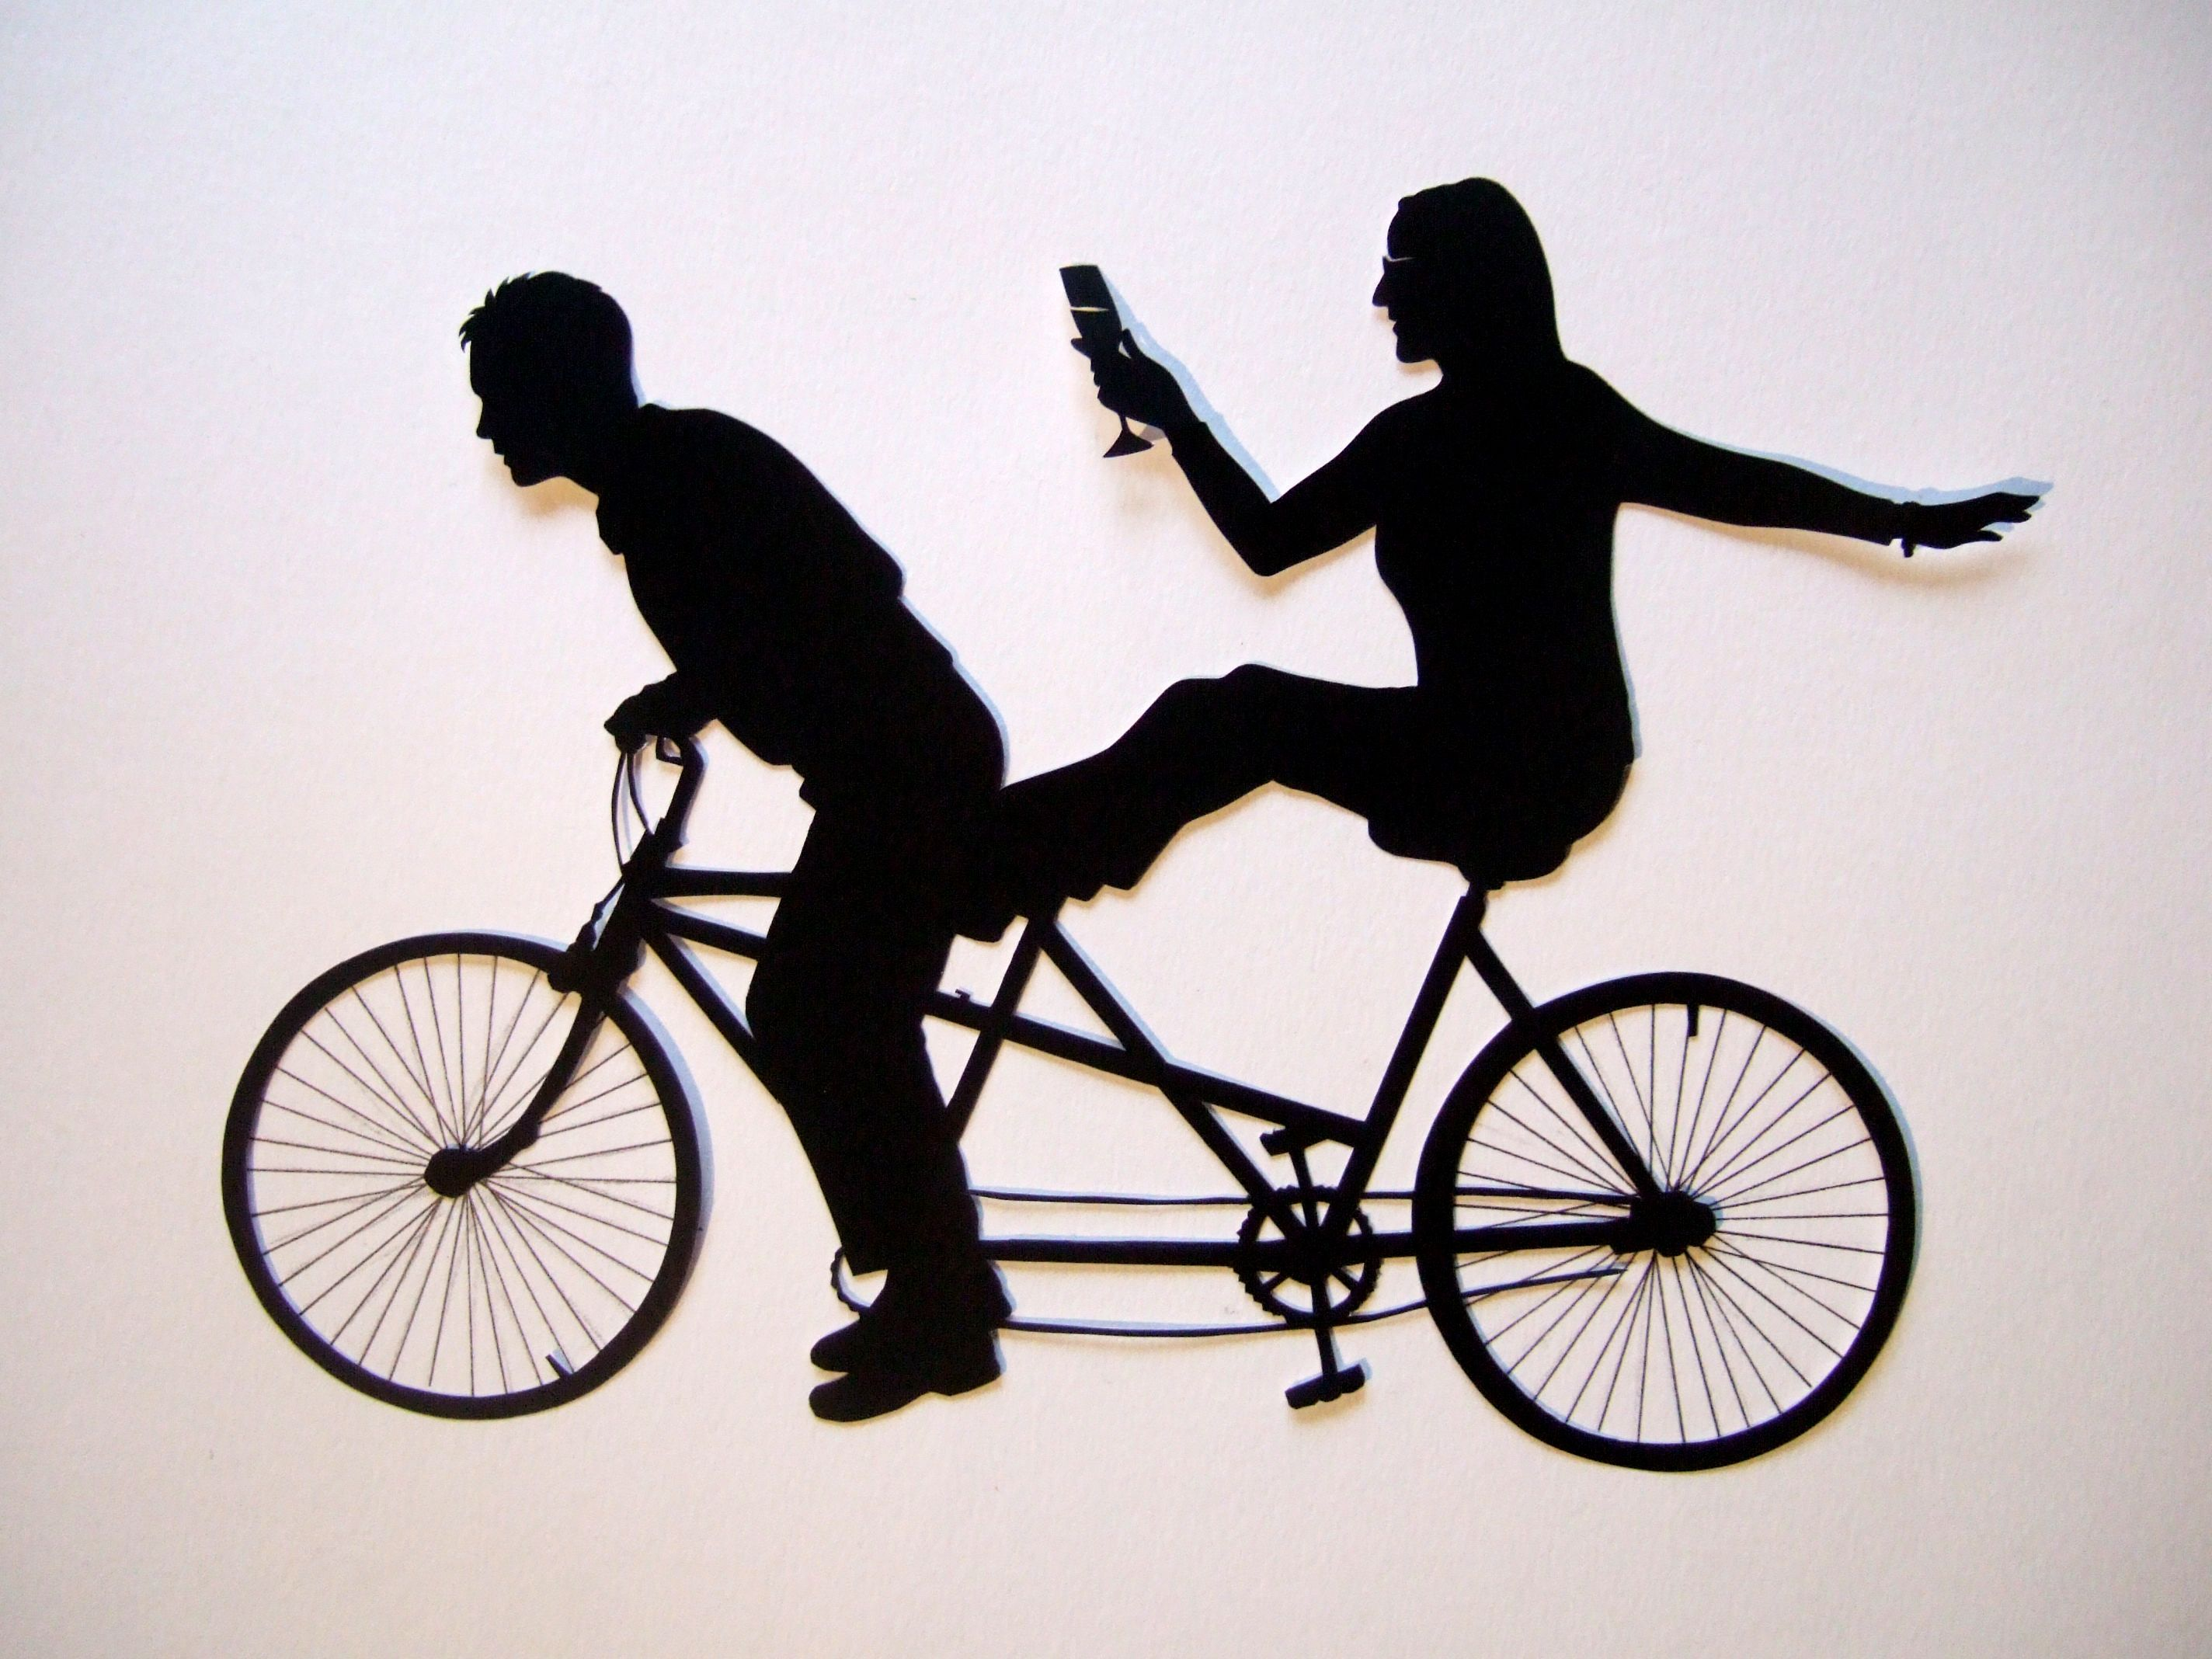 tandem mountain bike clipart.